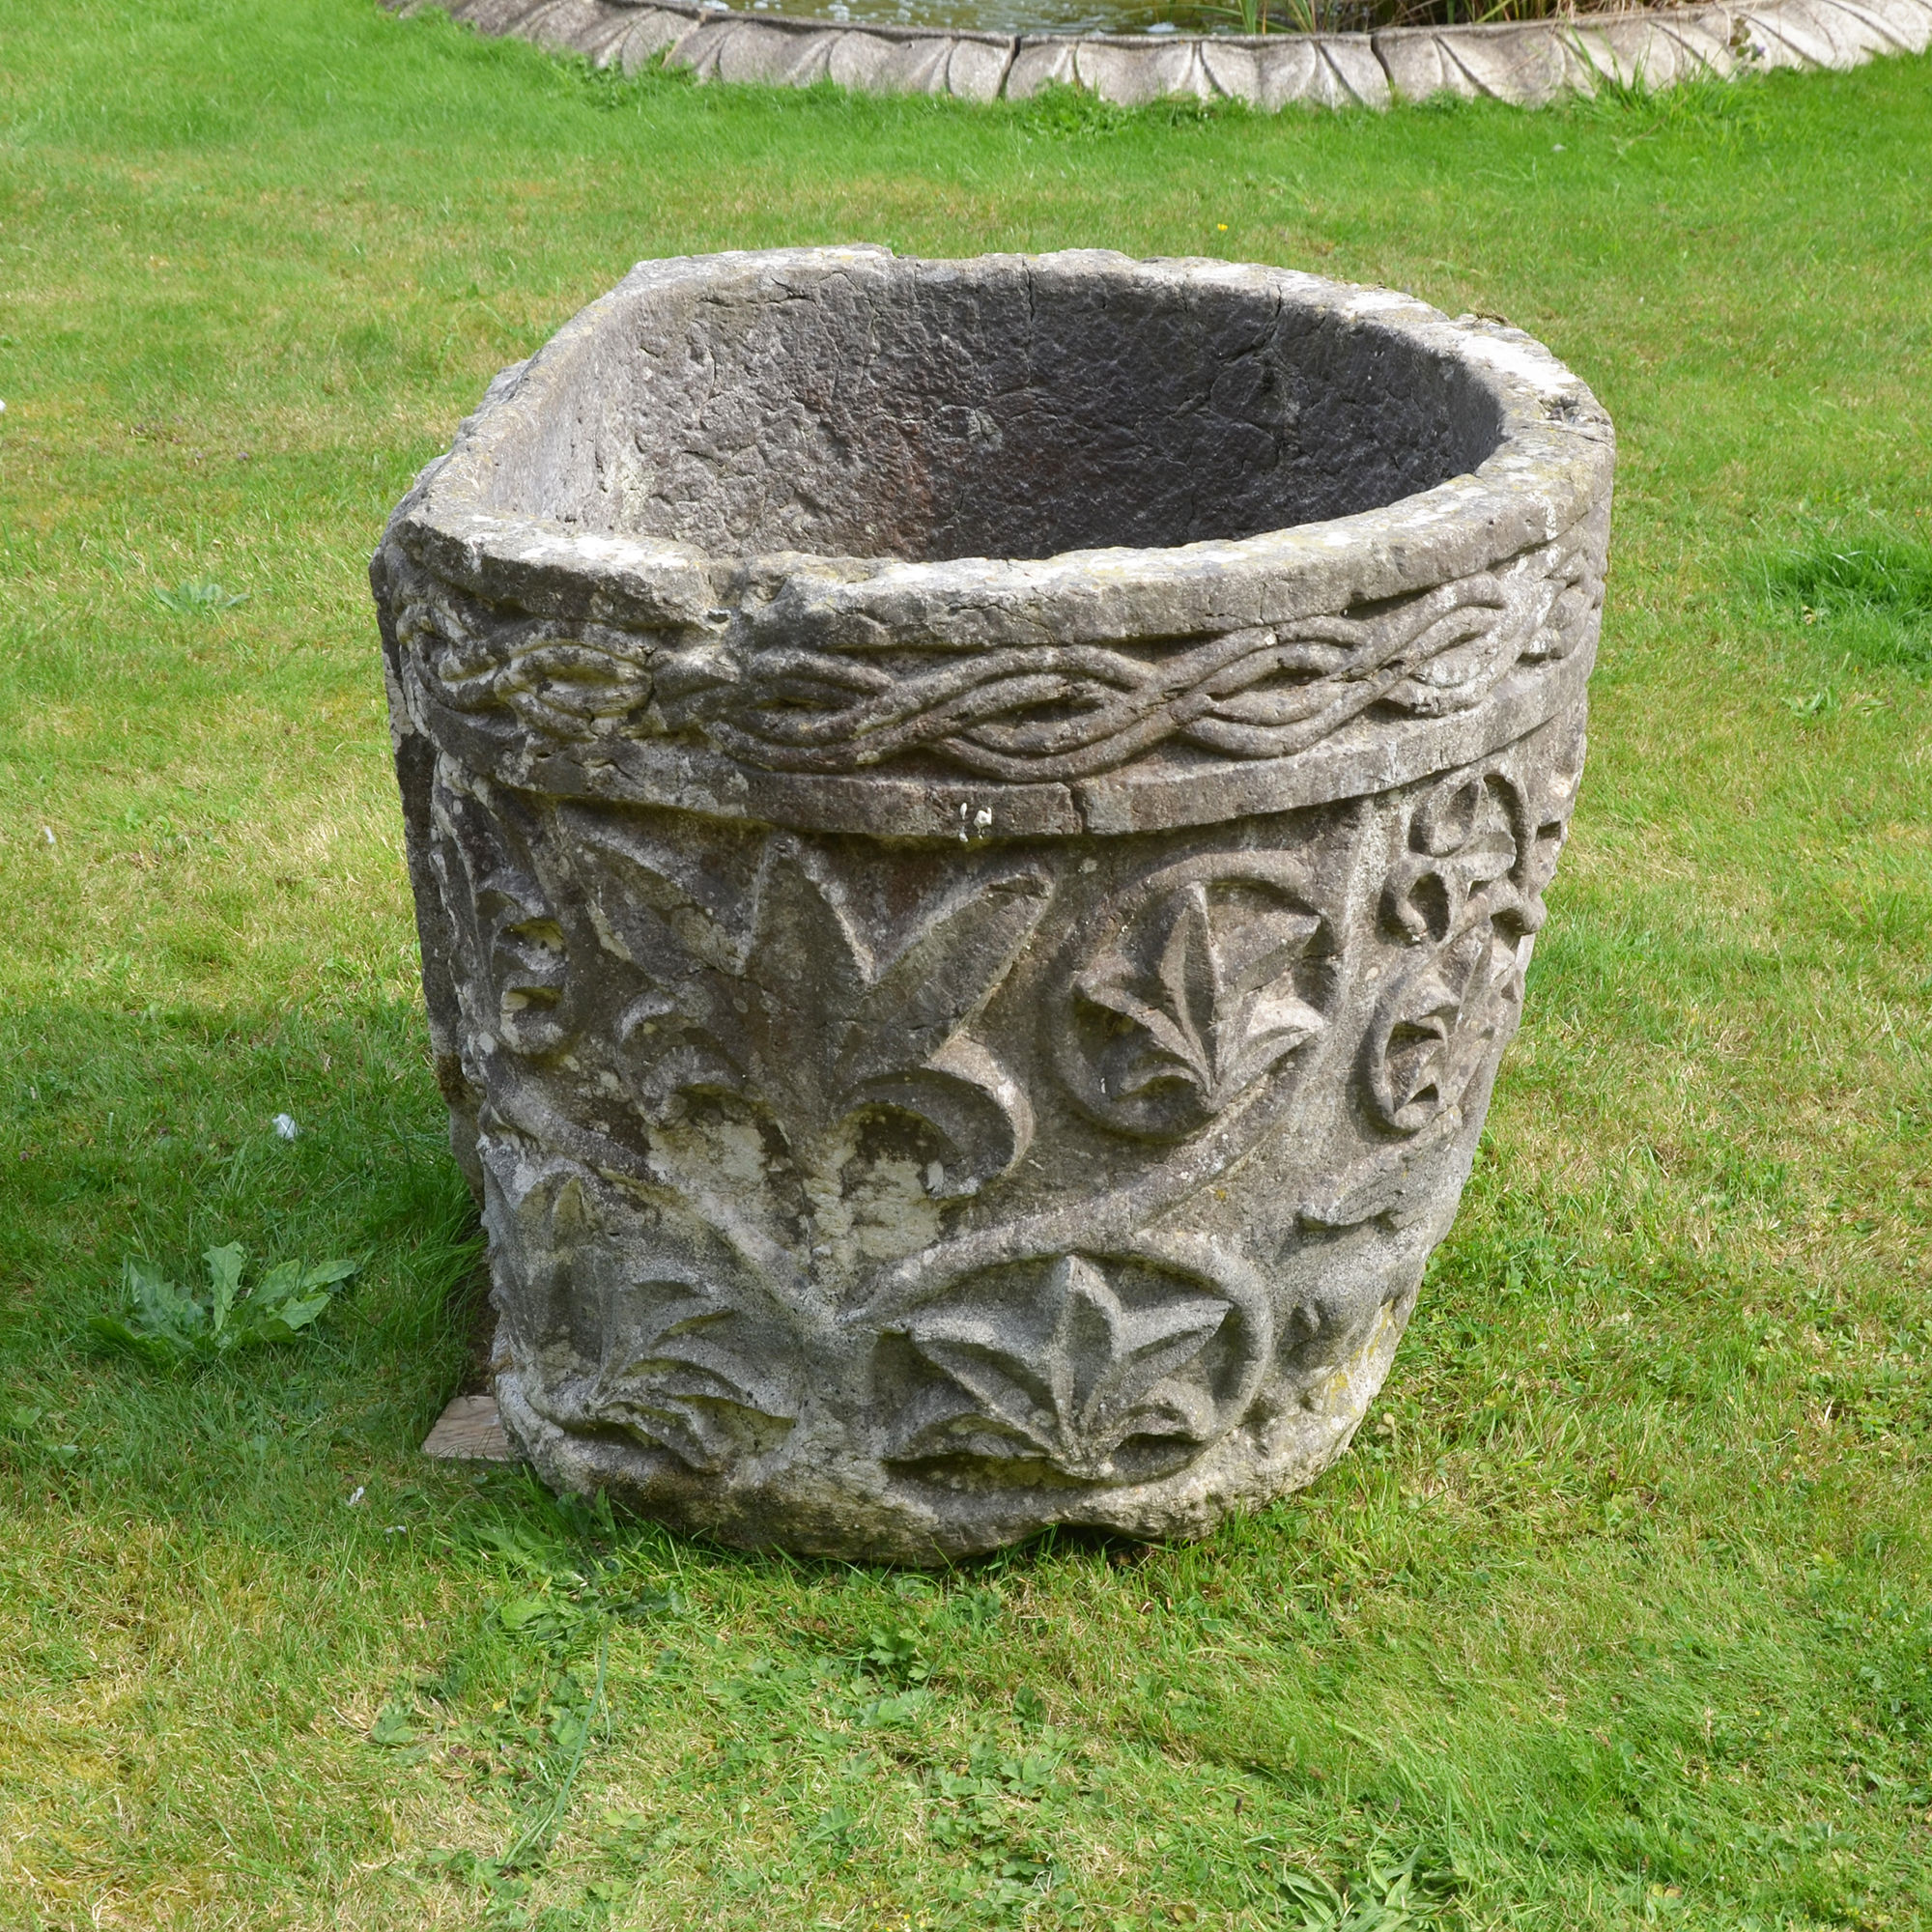 A late 19th century Istrian stone planter of irregular form